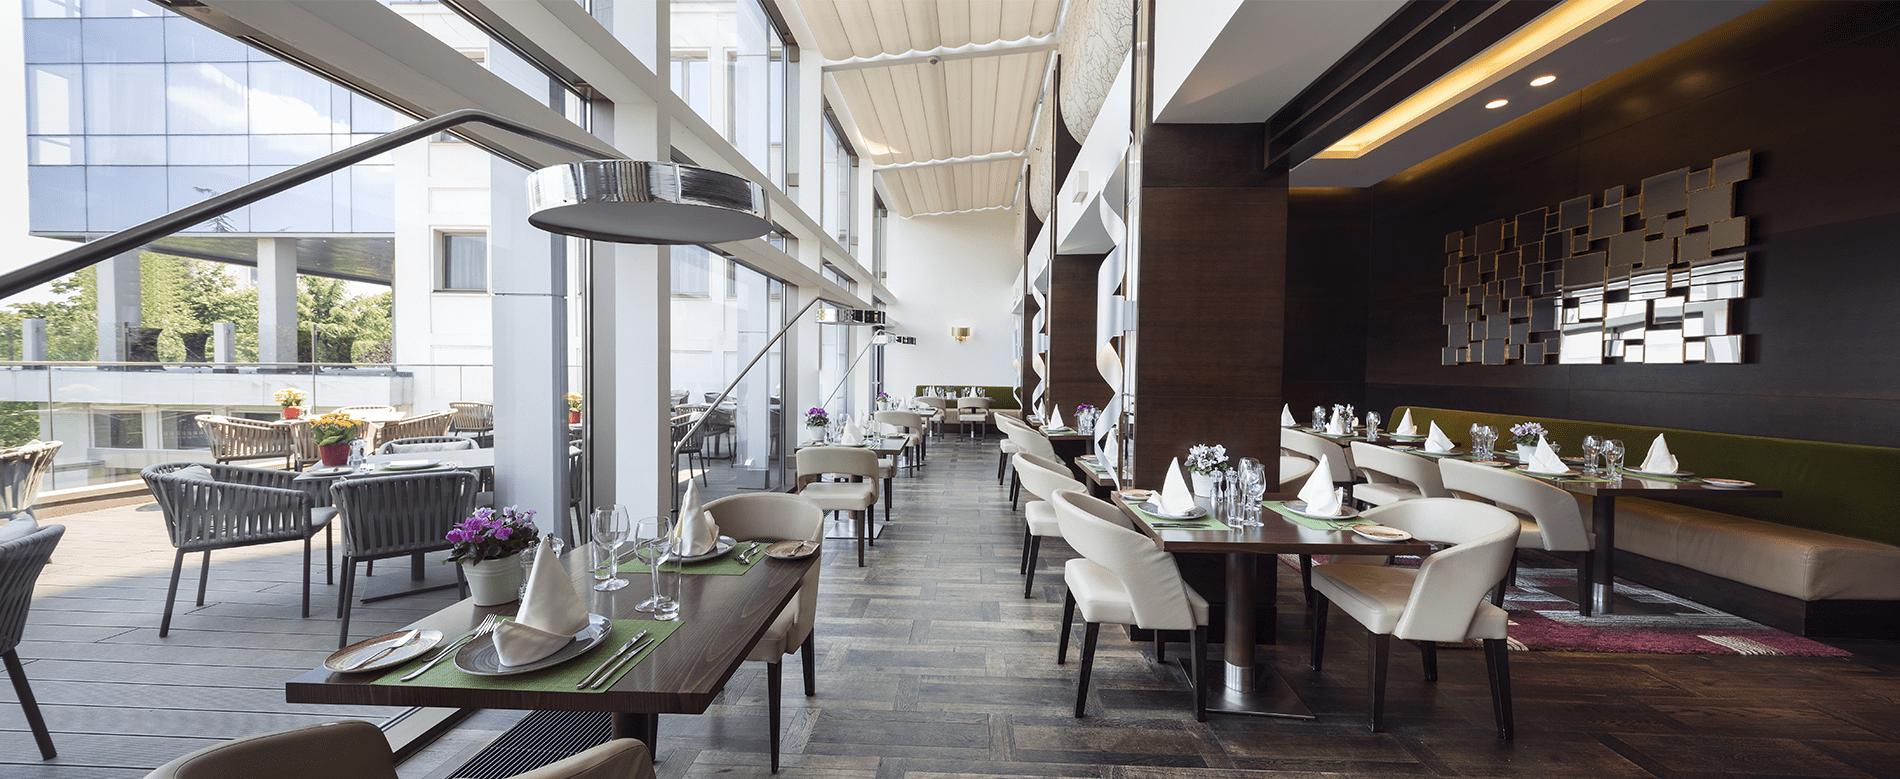 Moderner Speisesaal in smartem Hotel